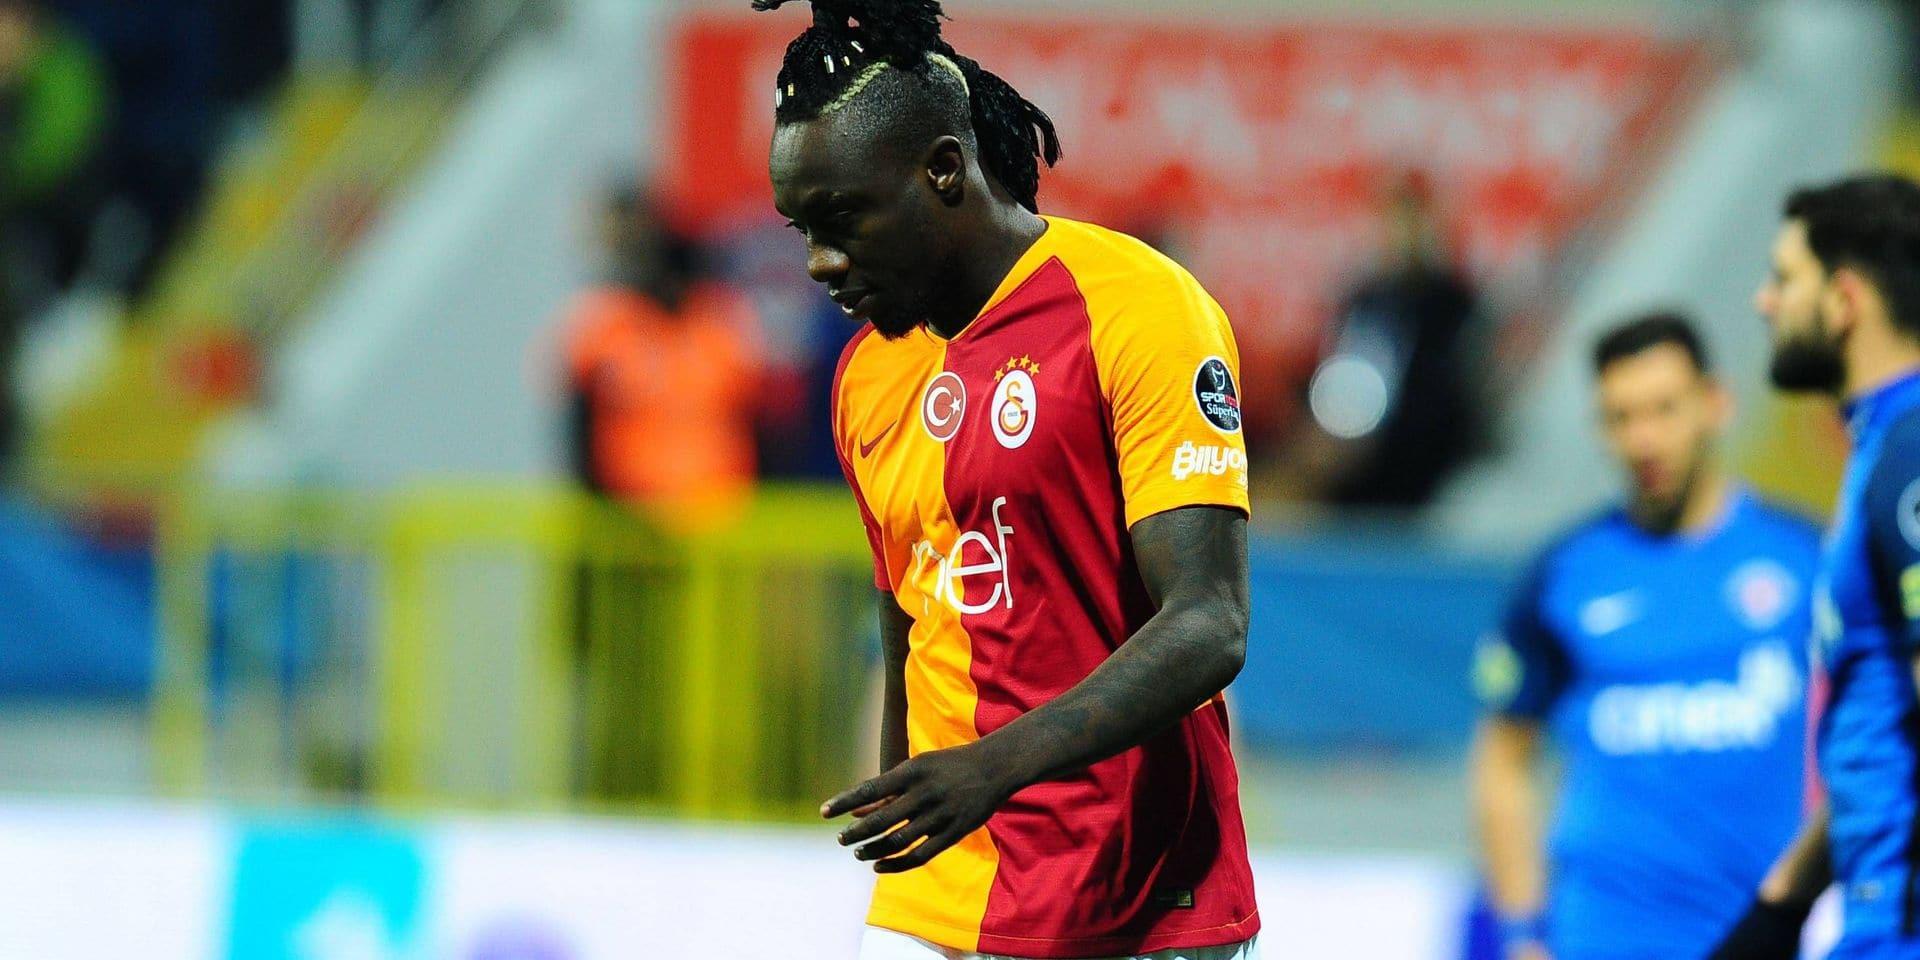 Mbaye Diagne of Galatasaray during the Turkish Super League football match between Kasimpasa and Ga